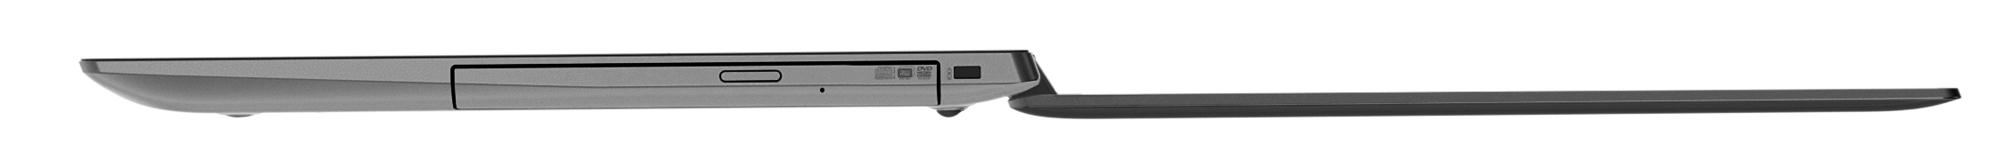 Фото  Ноутбук Lenovo ideapad 330-15 Onyx Black (81DC010SRA)